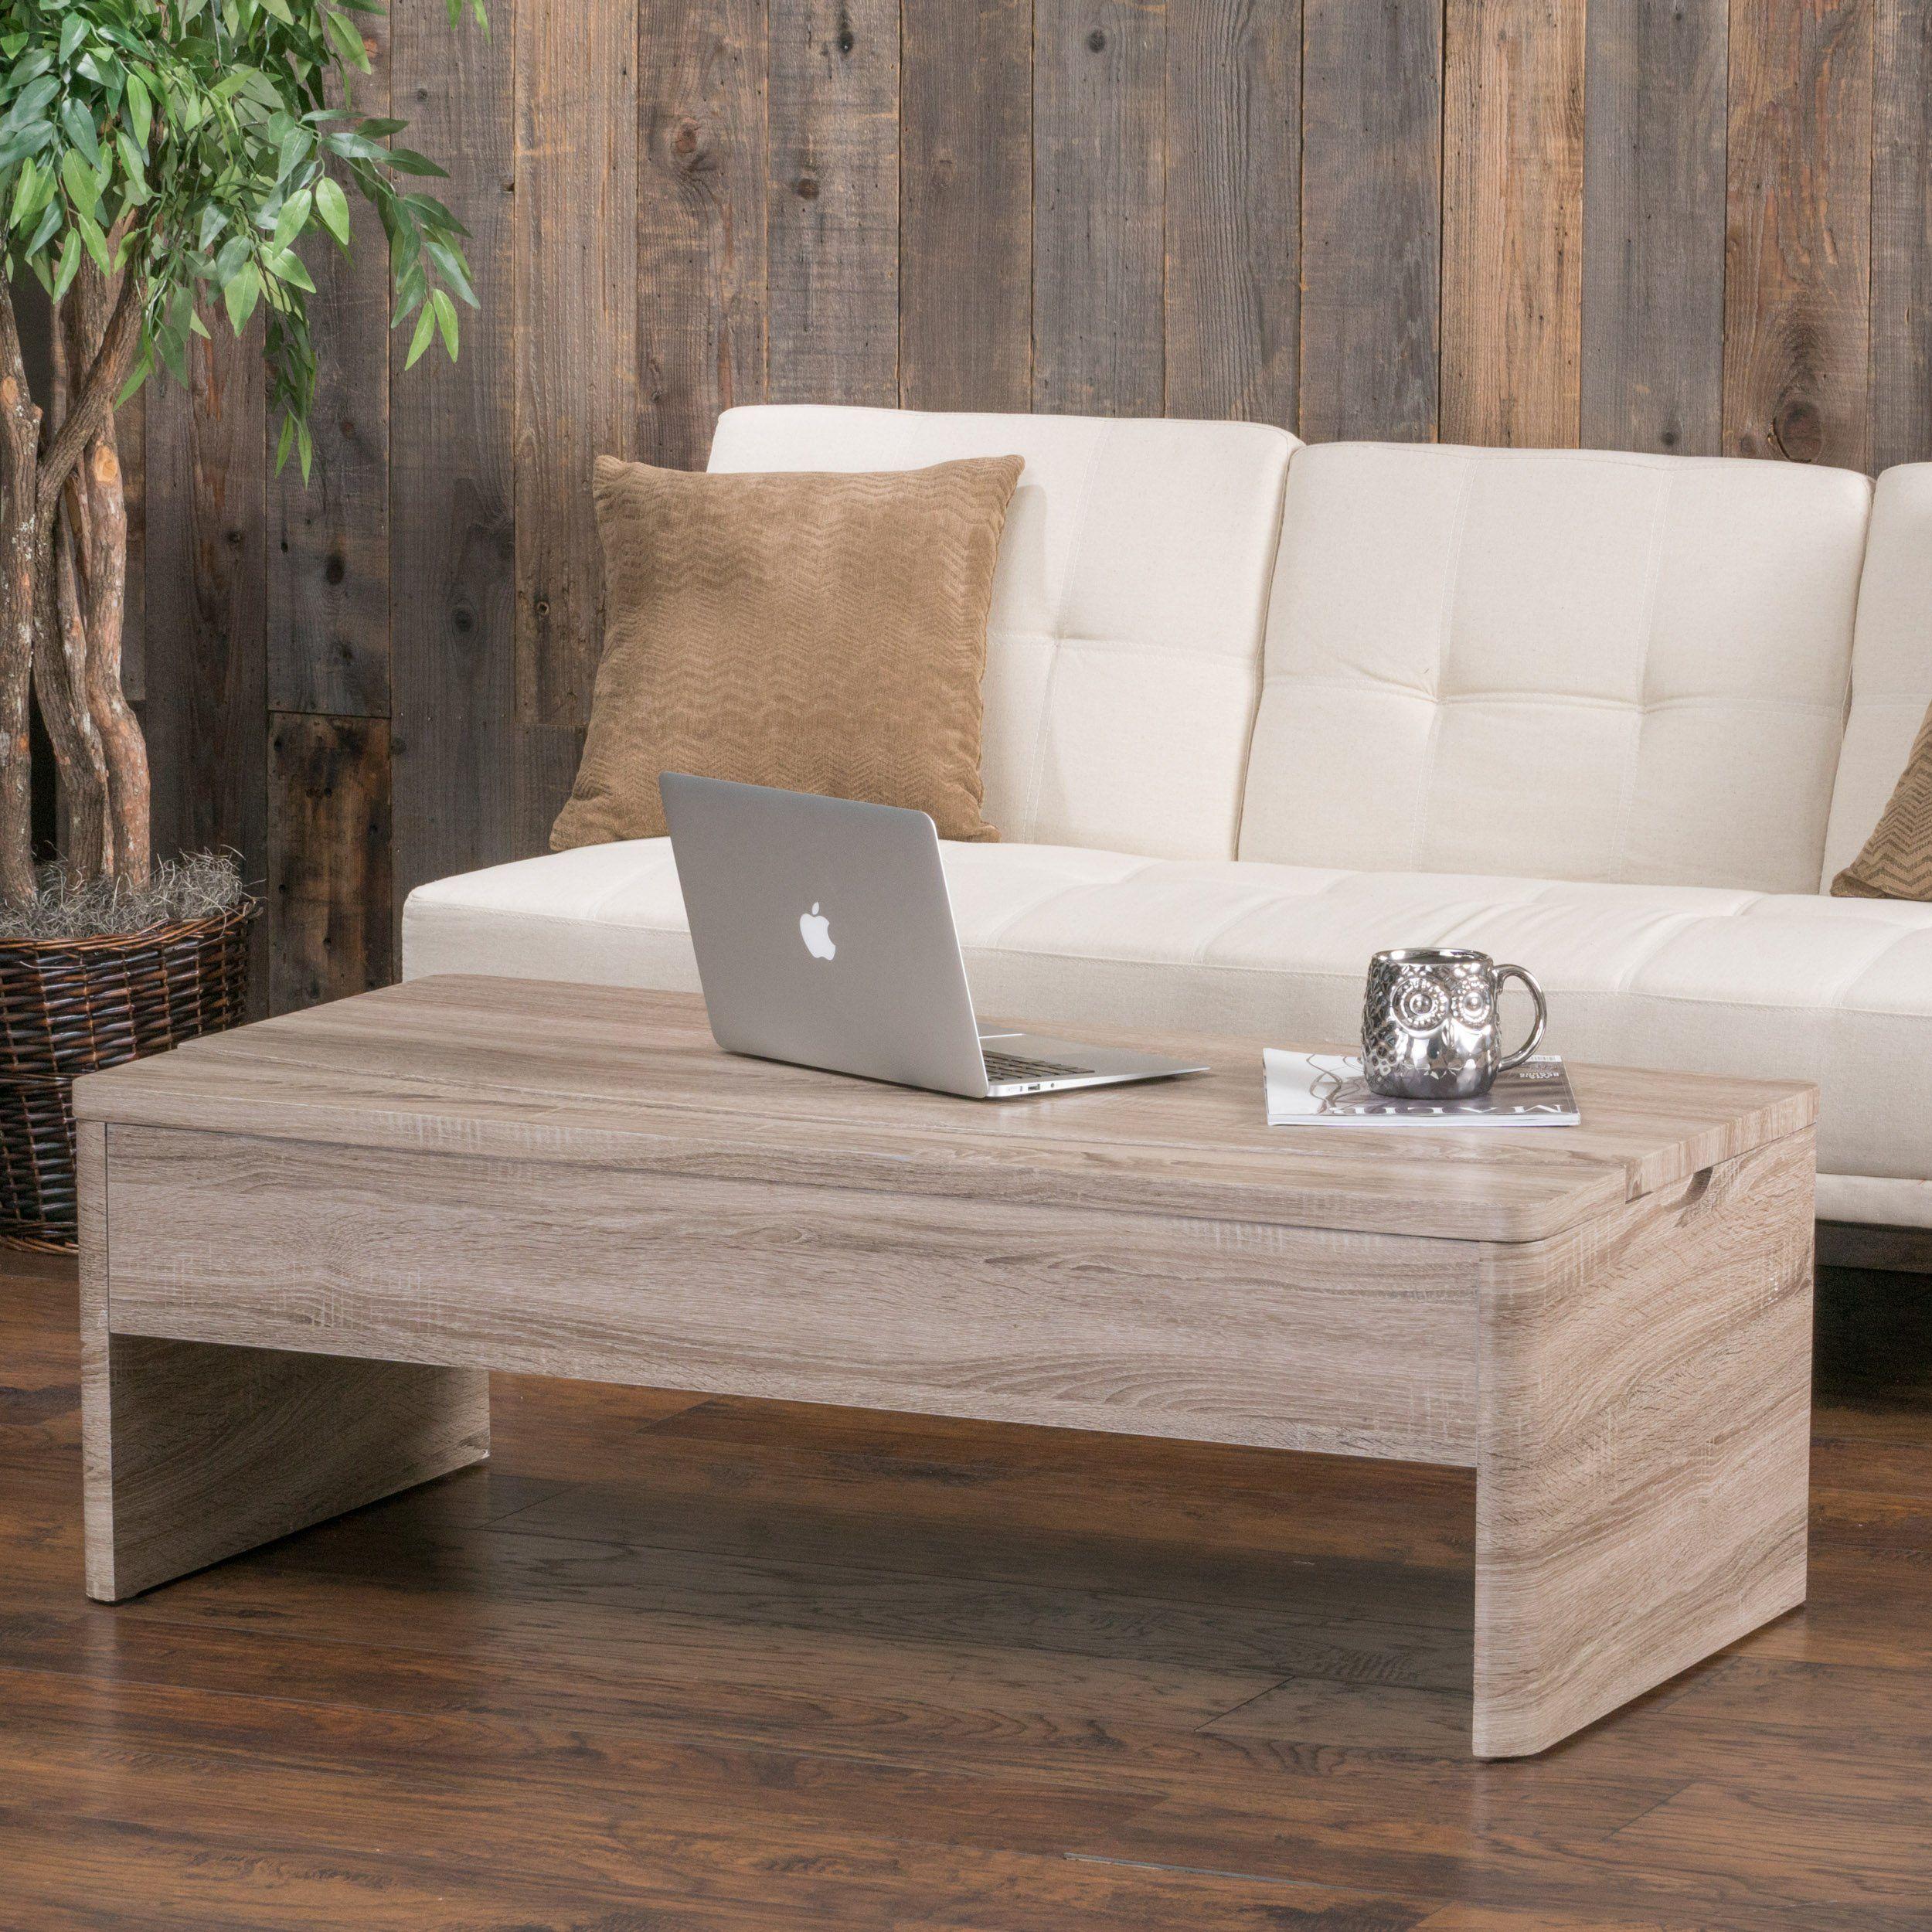 Mackinac Lift Functional Coffee Table Coffee Table Wood Coffee Table Coffee Table With Storage